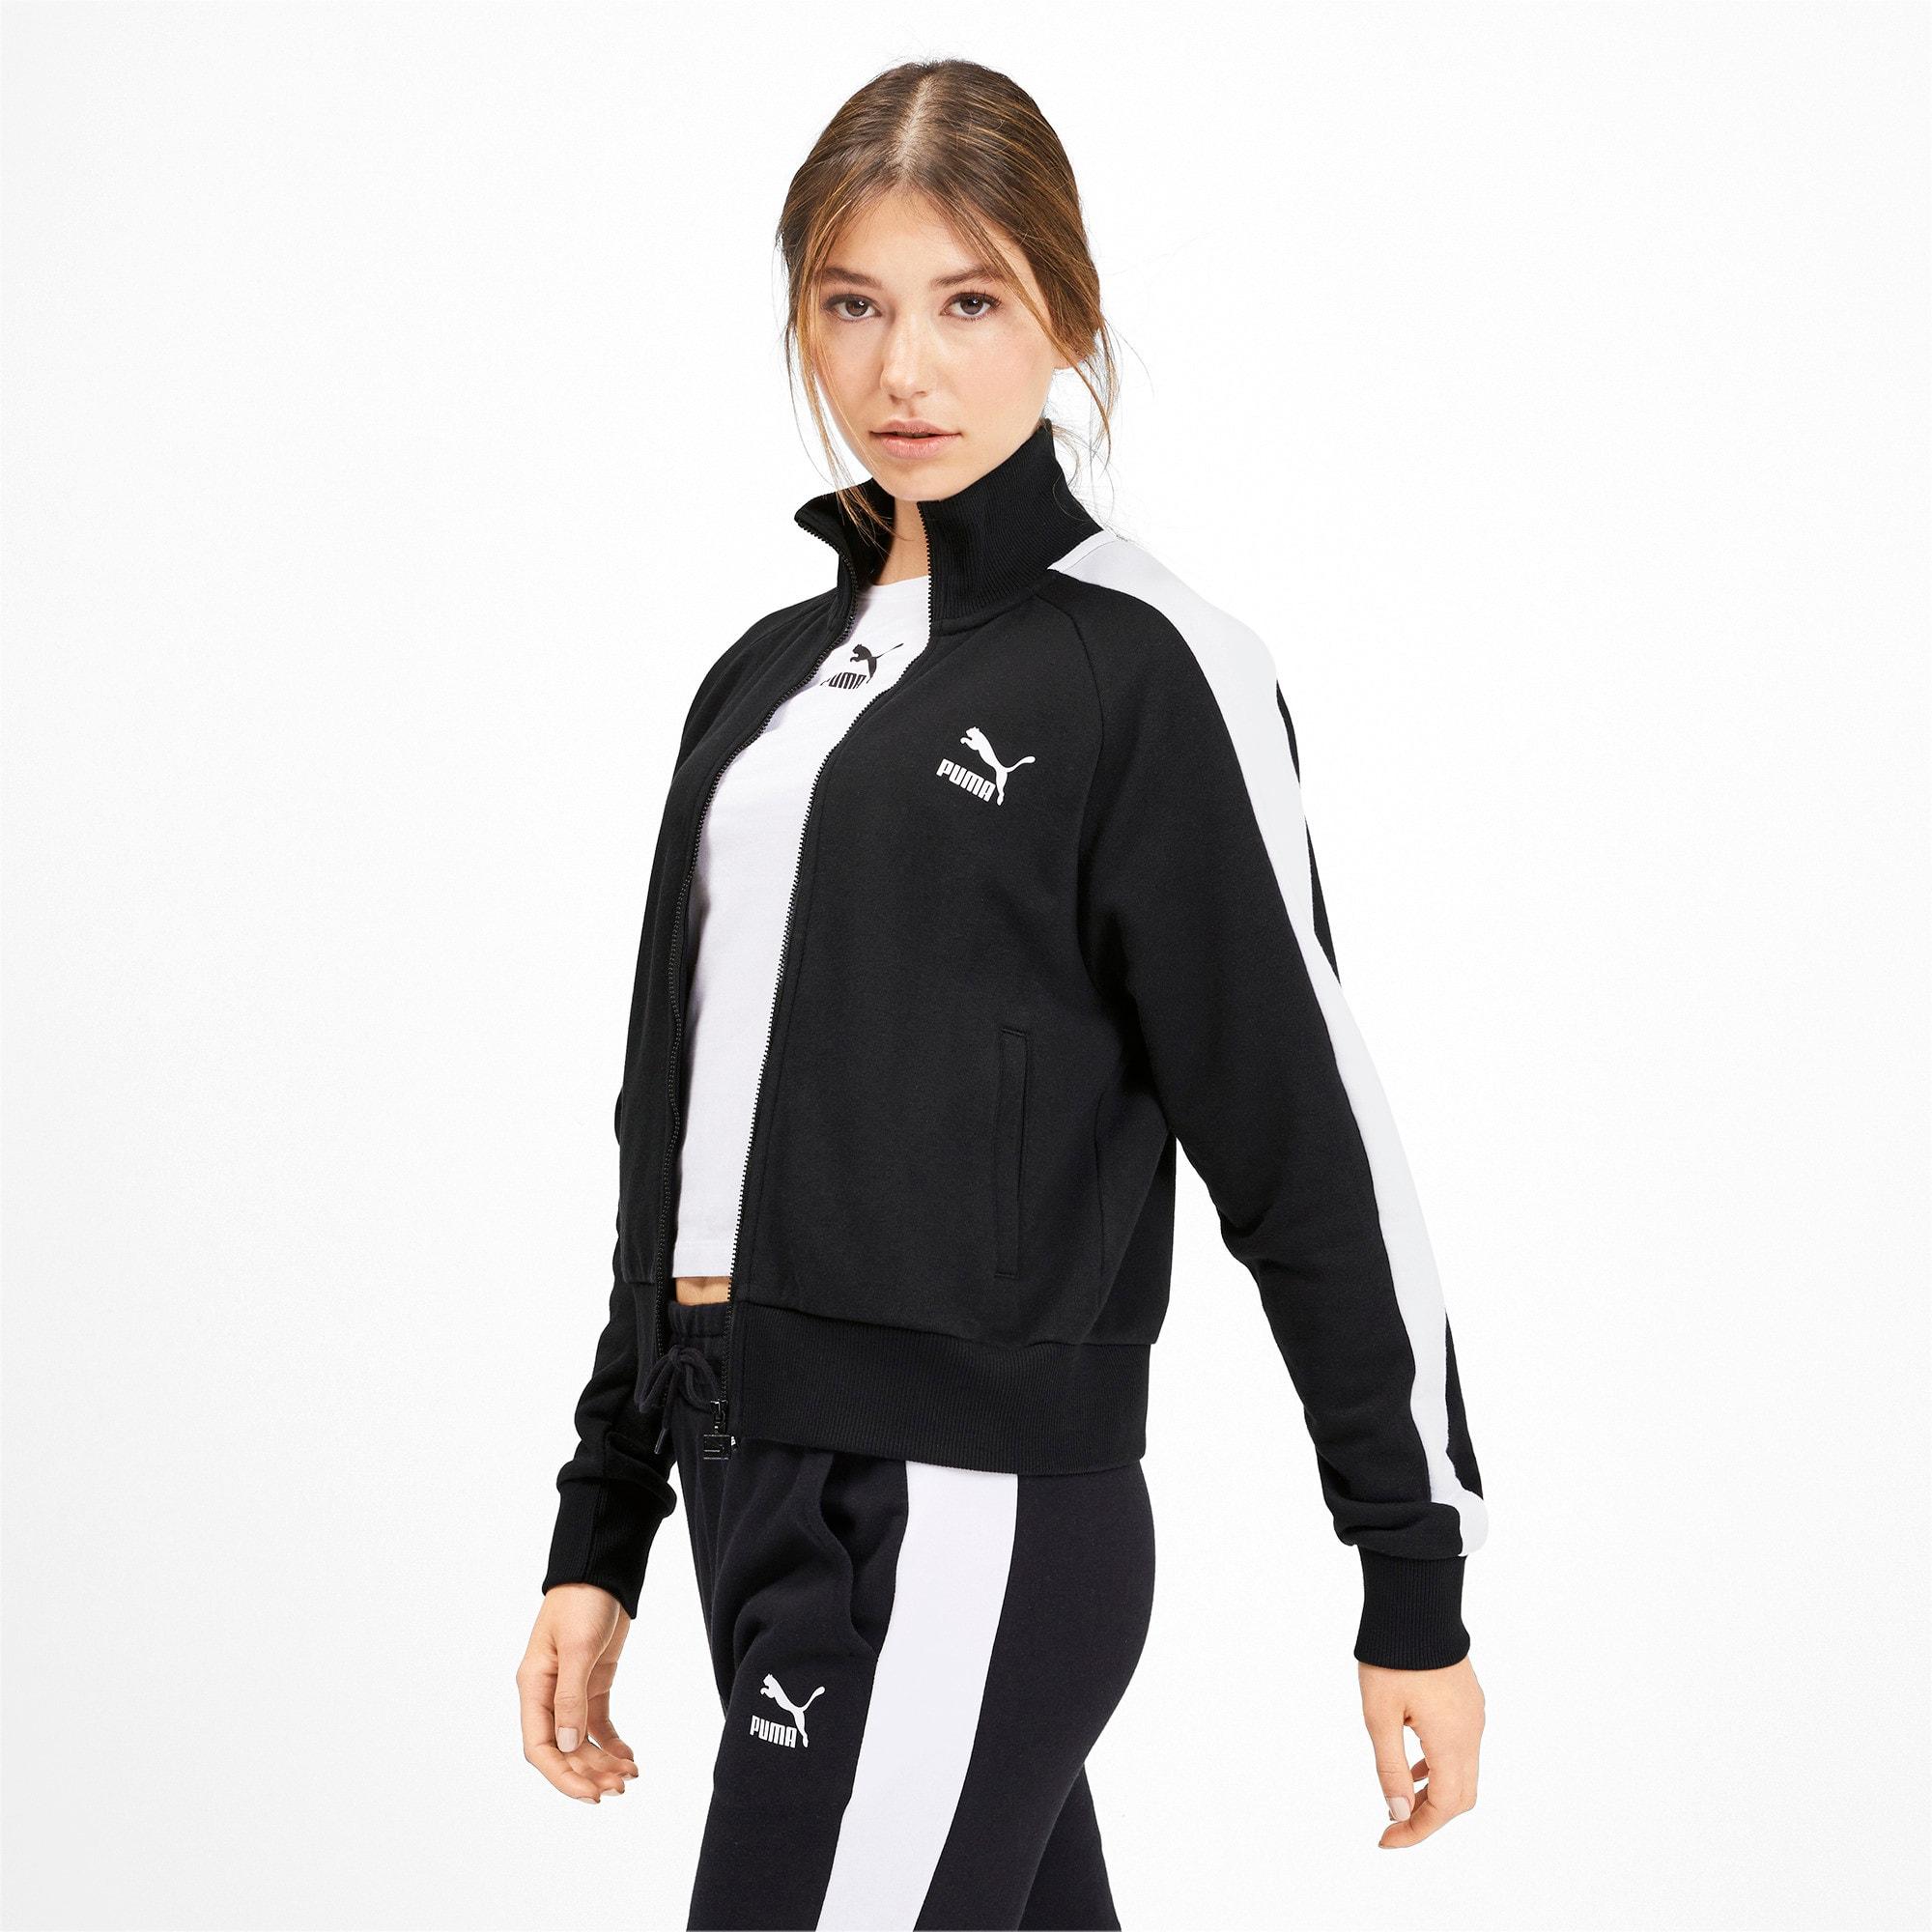 Miniatura 2 de Chaqueta deportiva Classics T7 para mujer, Puma Black, mediano